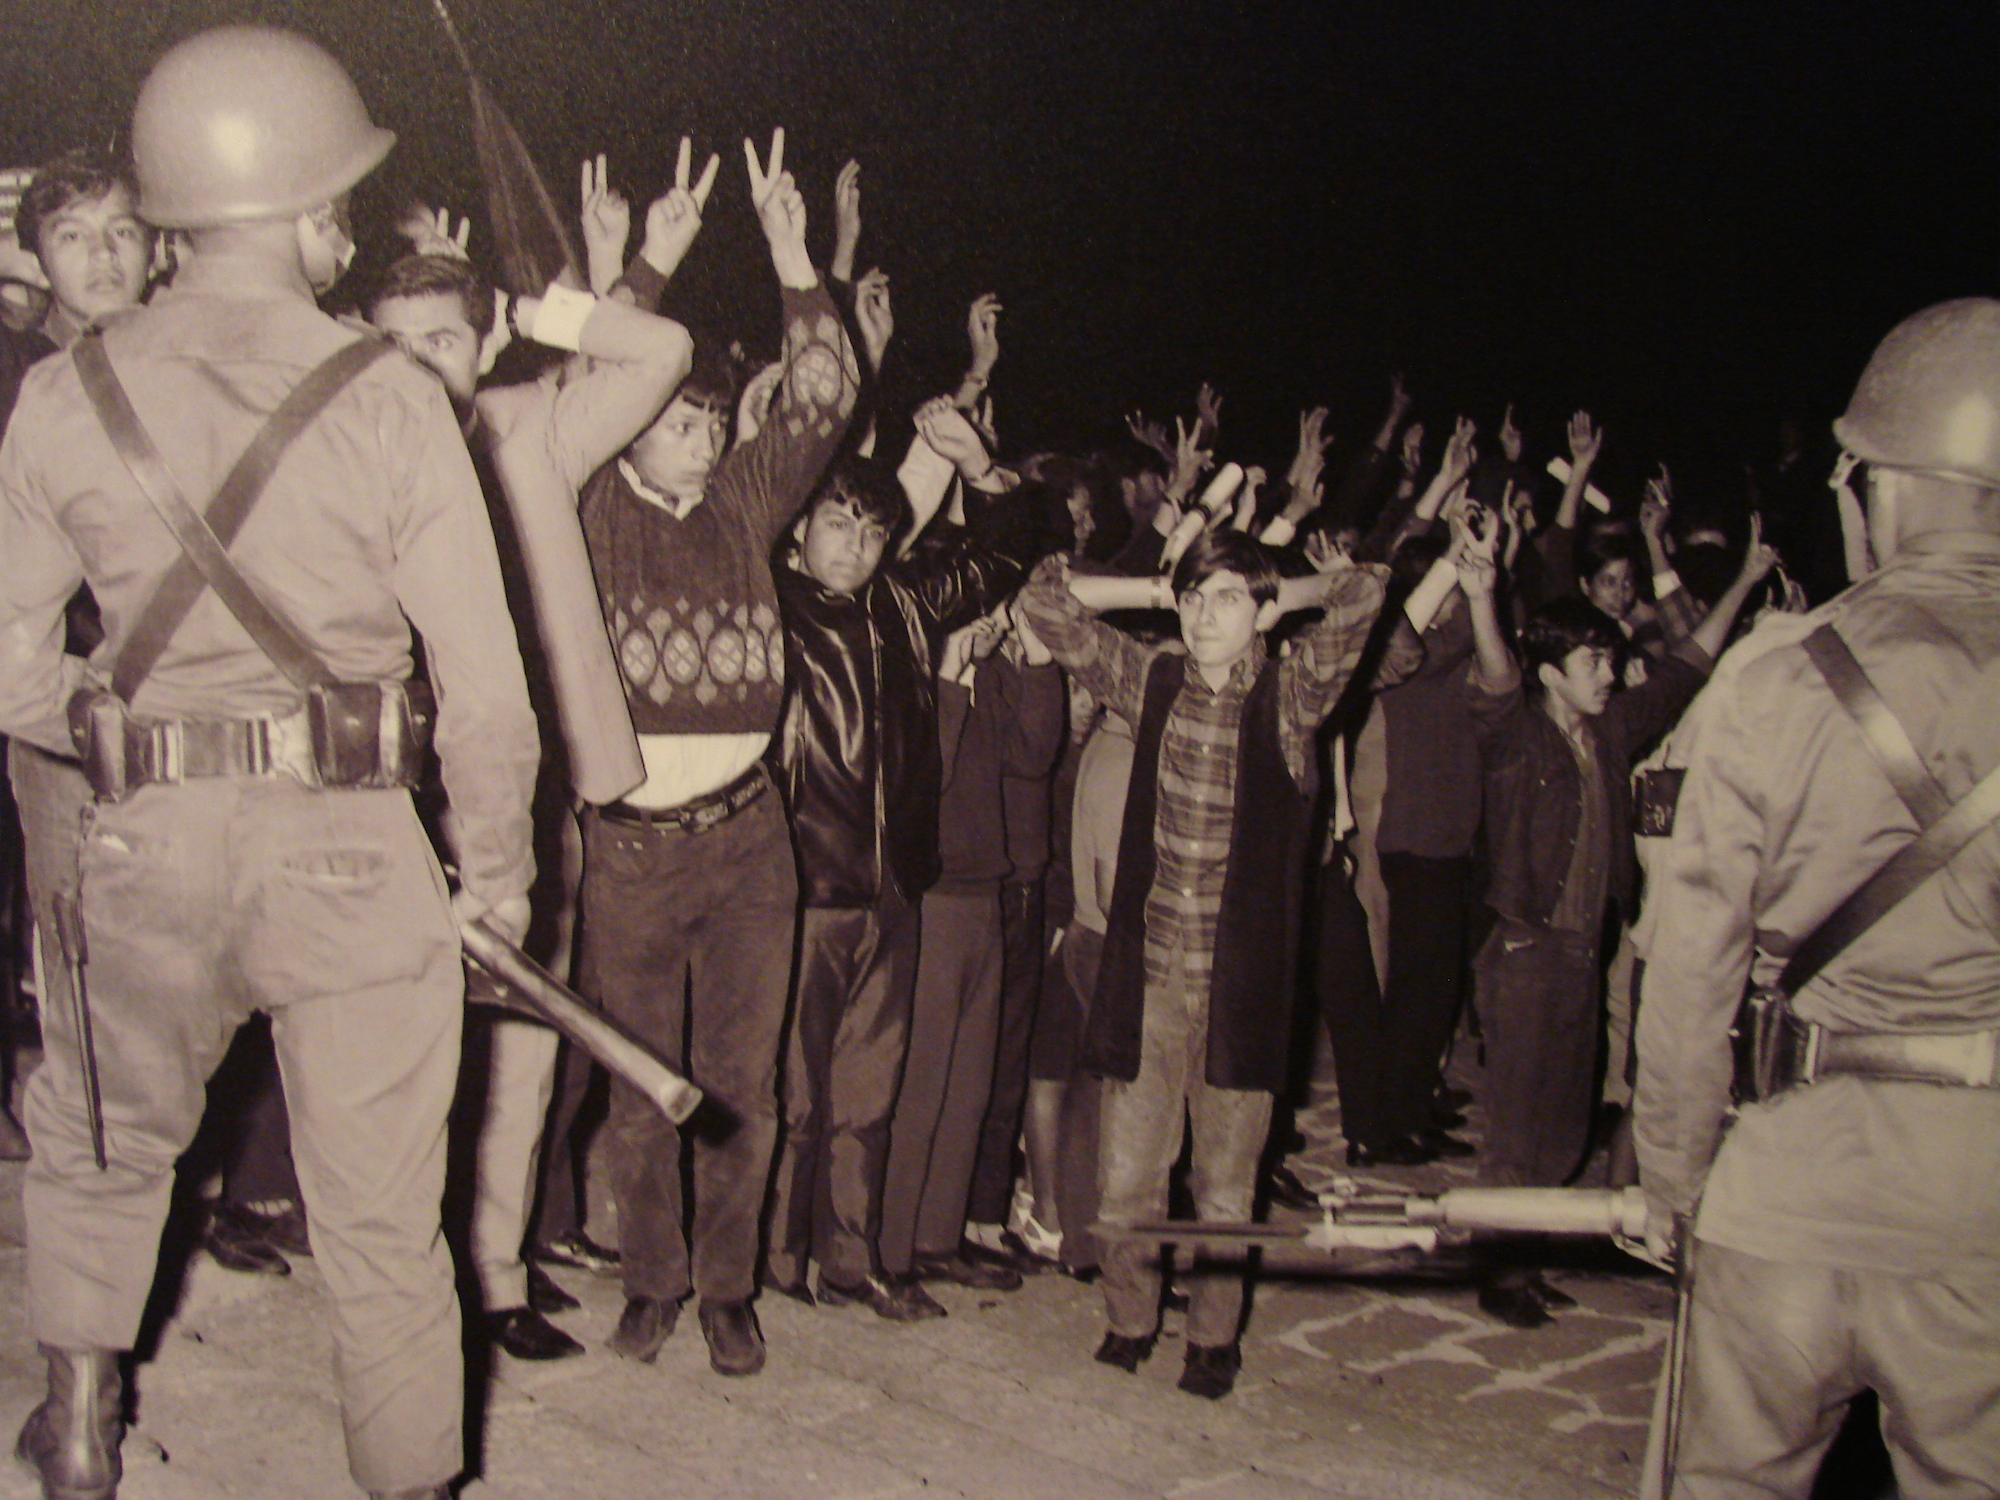 El 2 de Octubre No Se Olvida: A Look Back at Films About the 1968 Student Protests in Mexico